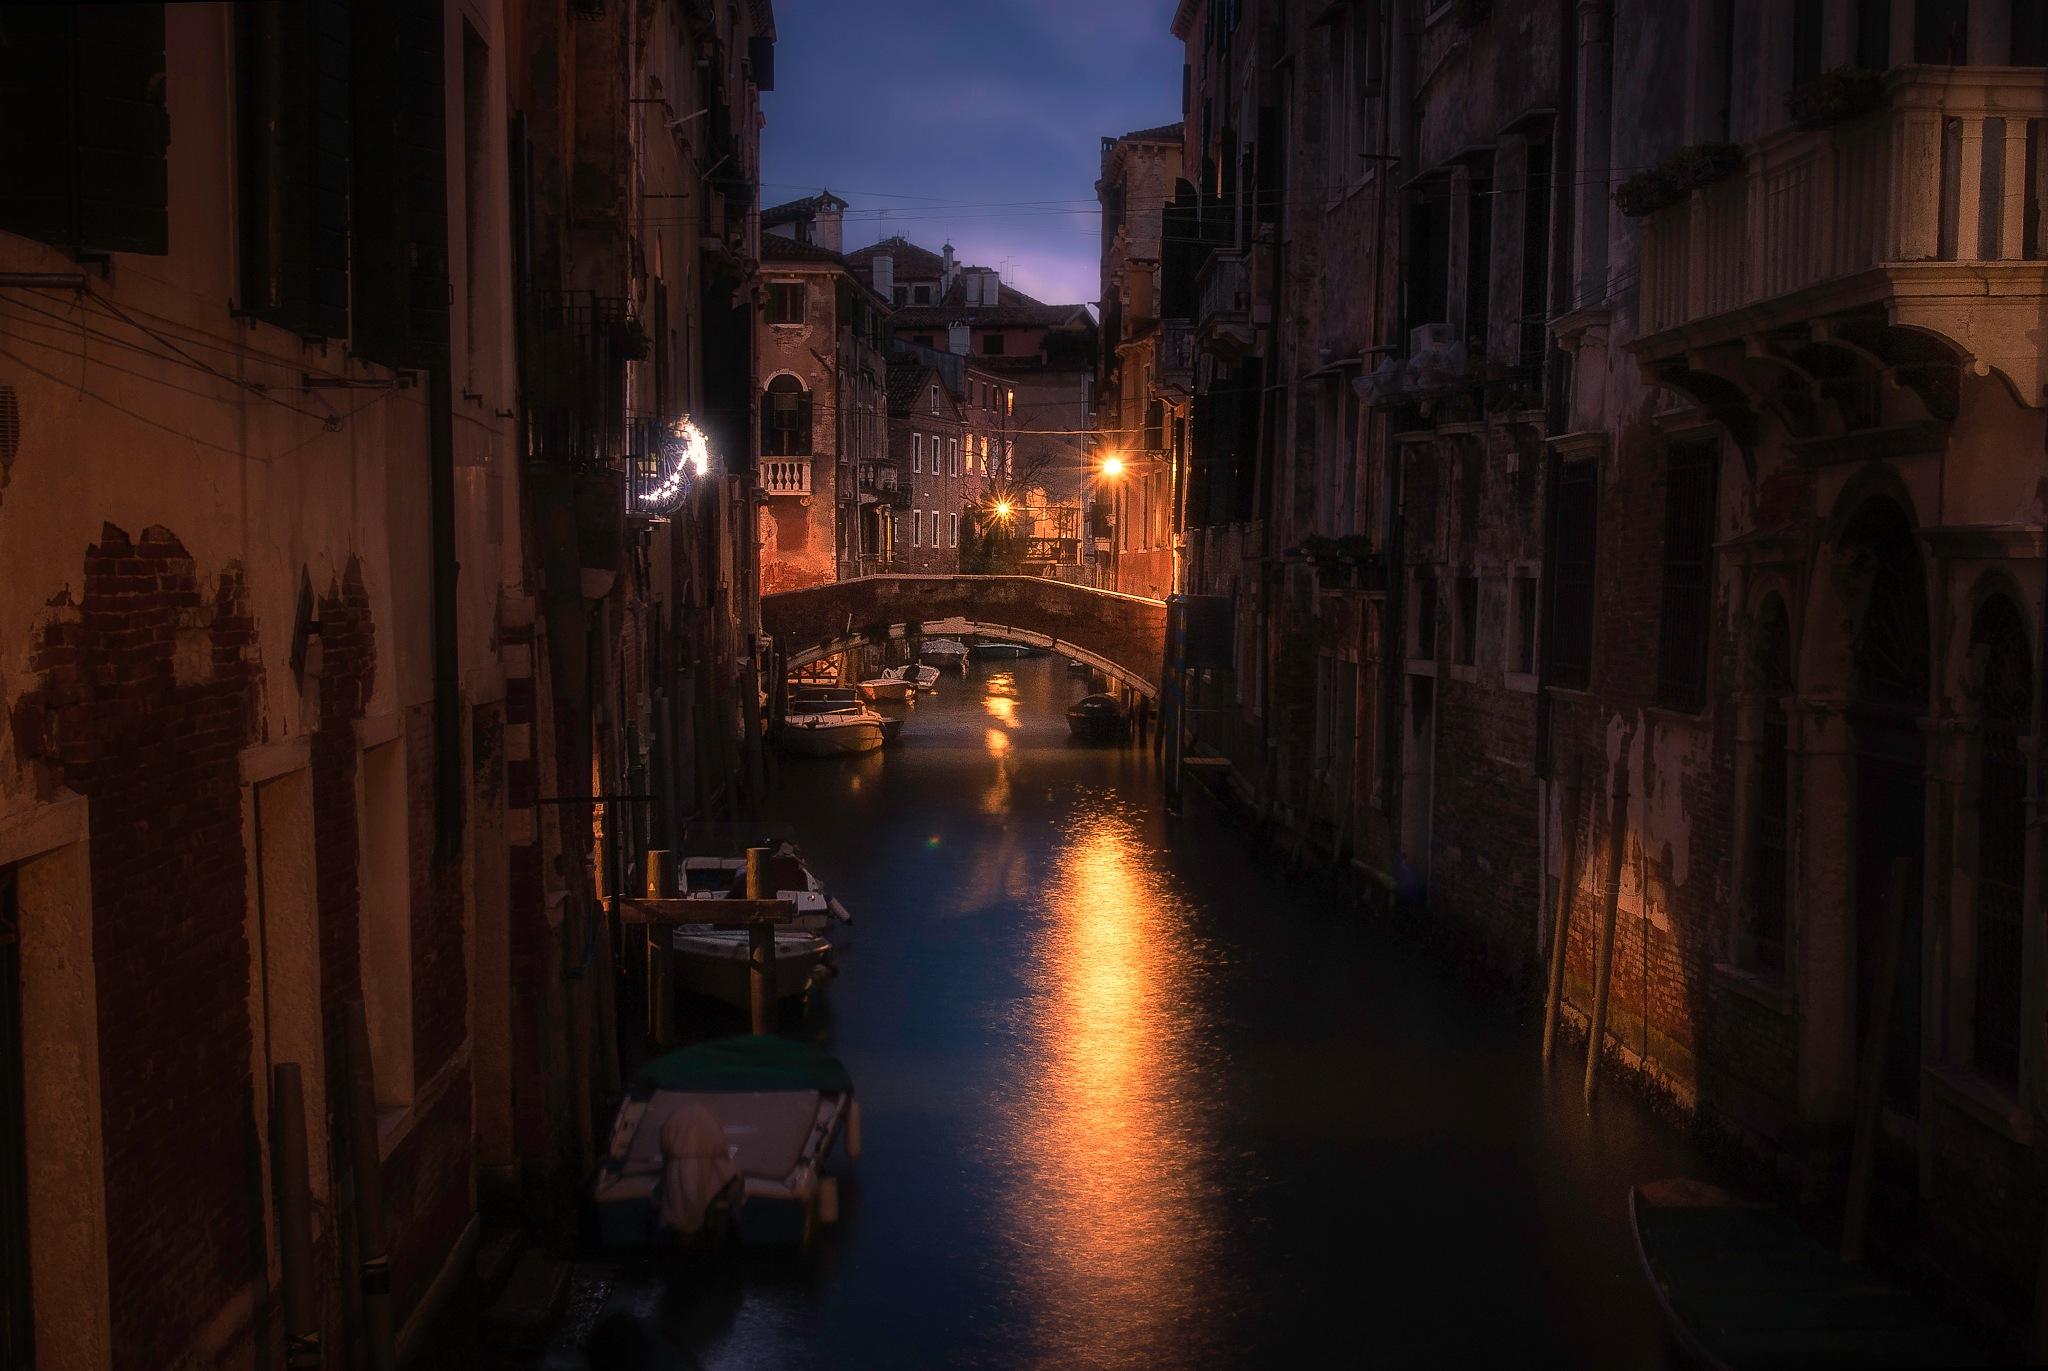 Venetian paths 81(Ponte del fontego) by mauriziofecchio